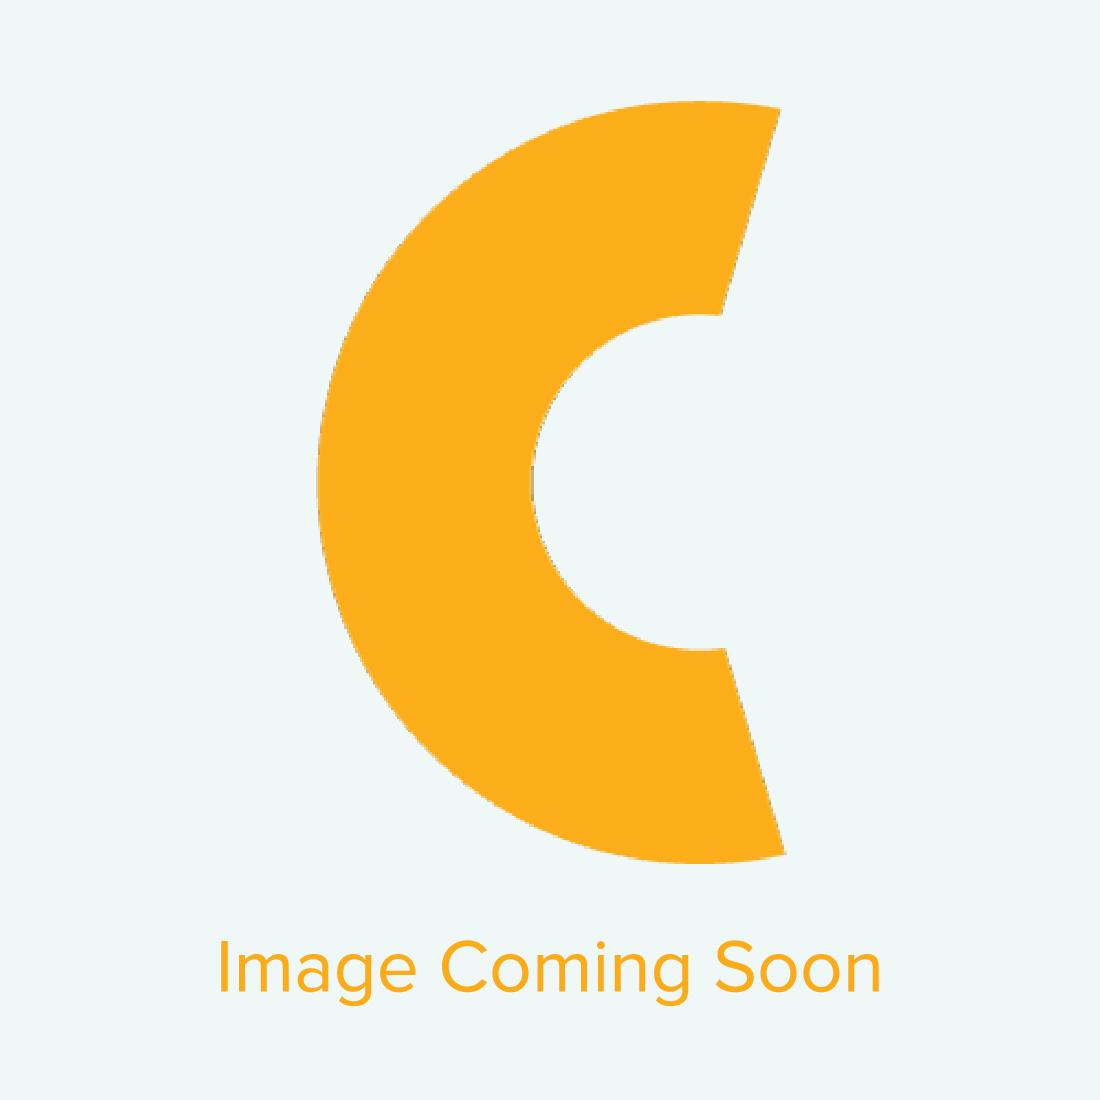 OKI Data 8432WT Fusing Unit - Replacement Fuser Kit